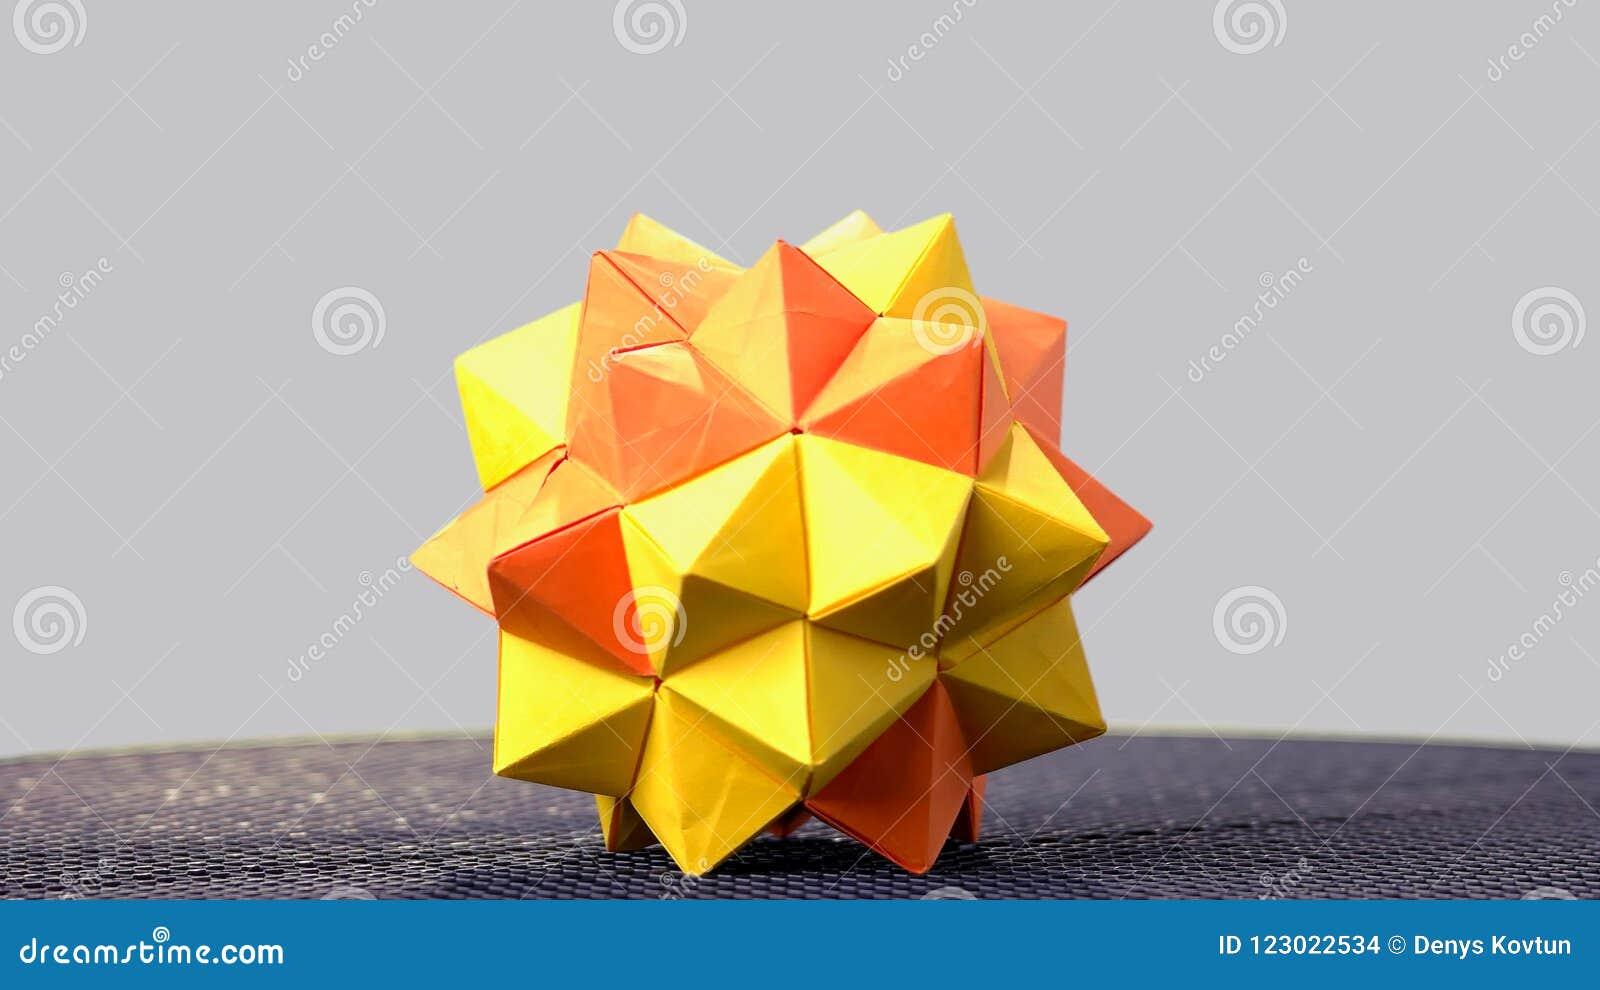 DIY Origami: DIY Color origami ball   Origami ball   450x800